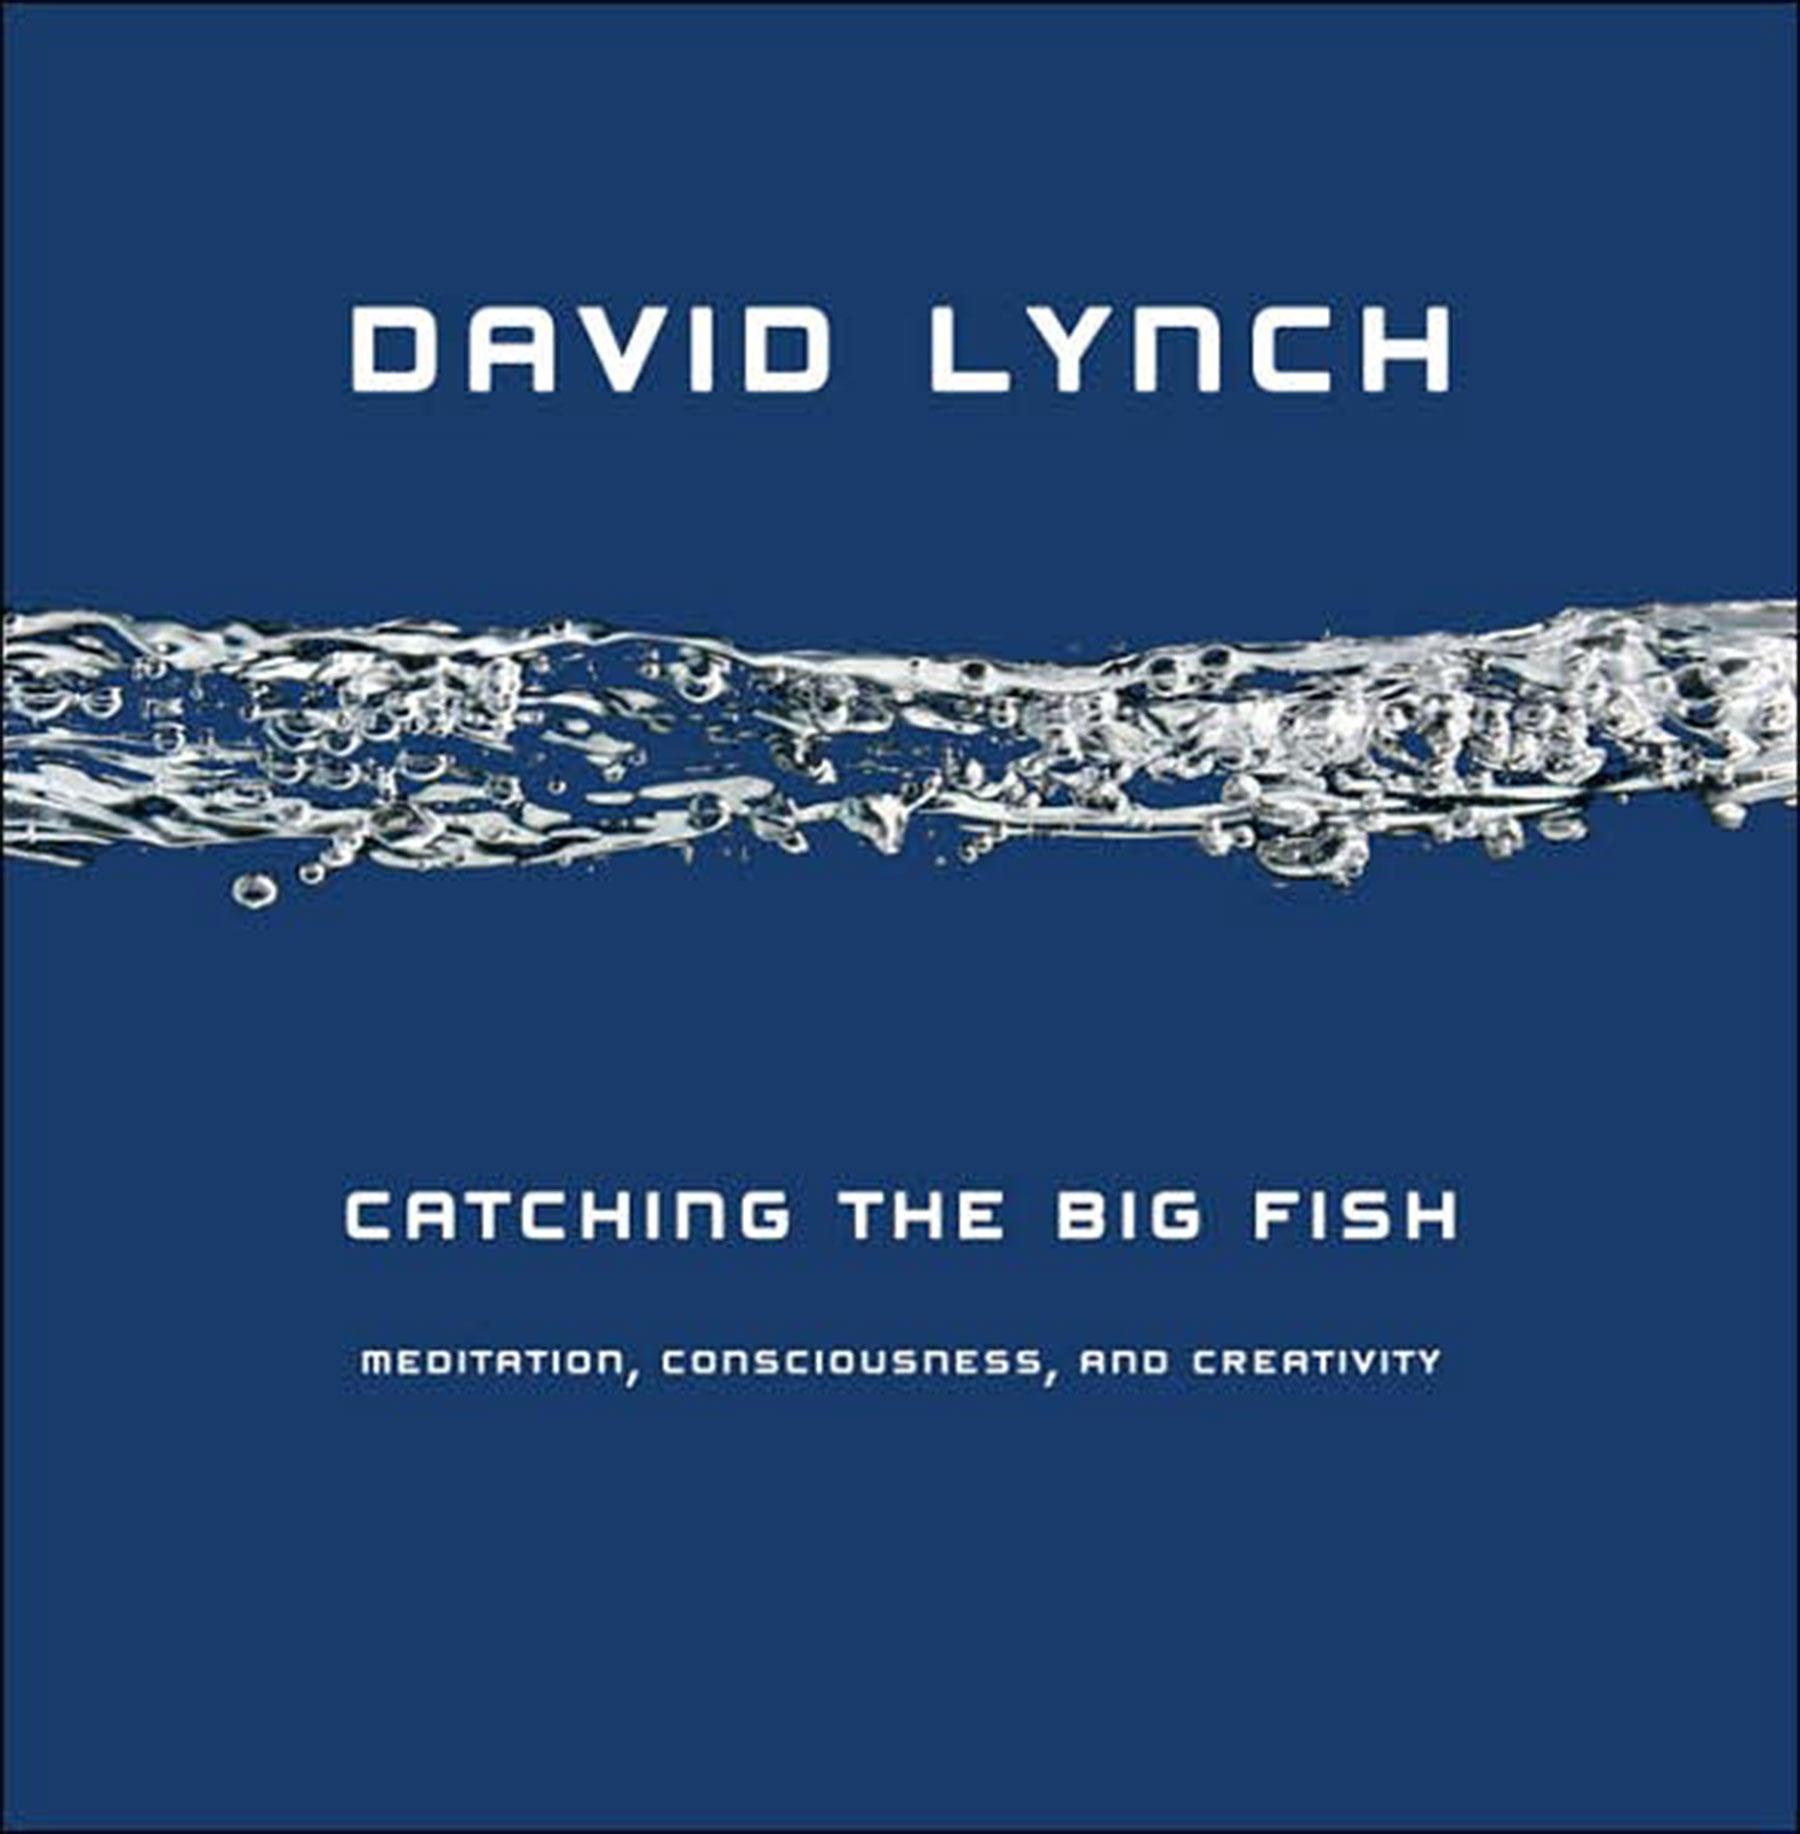 David LynchCatching the Big FishHardcover Book Cover